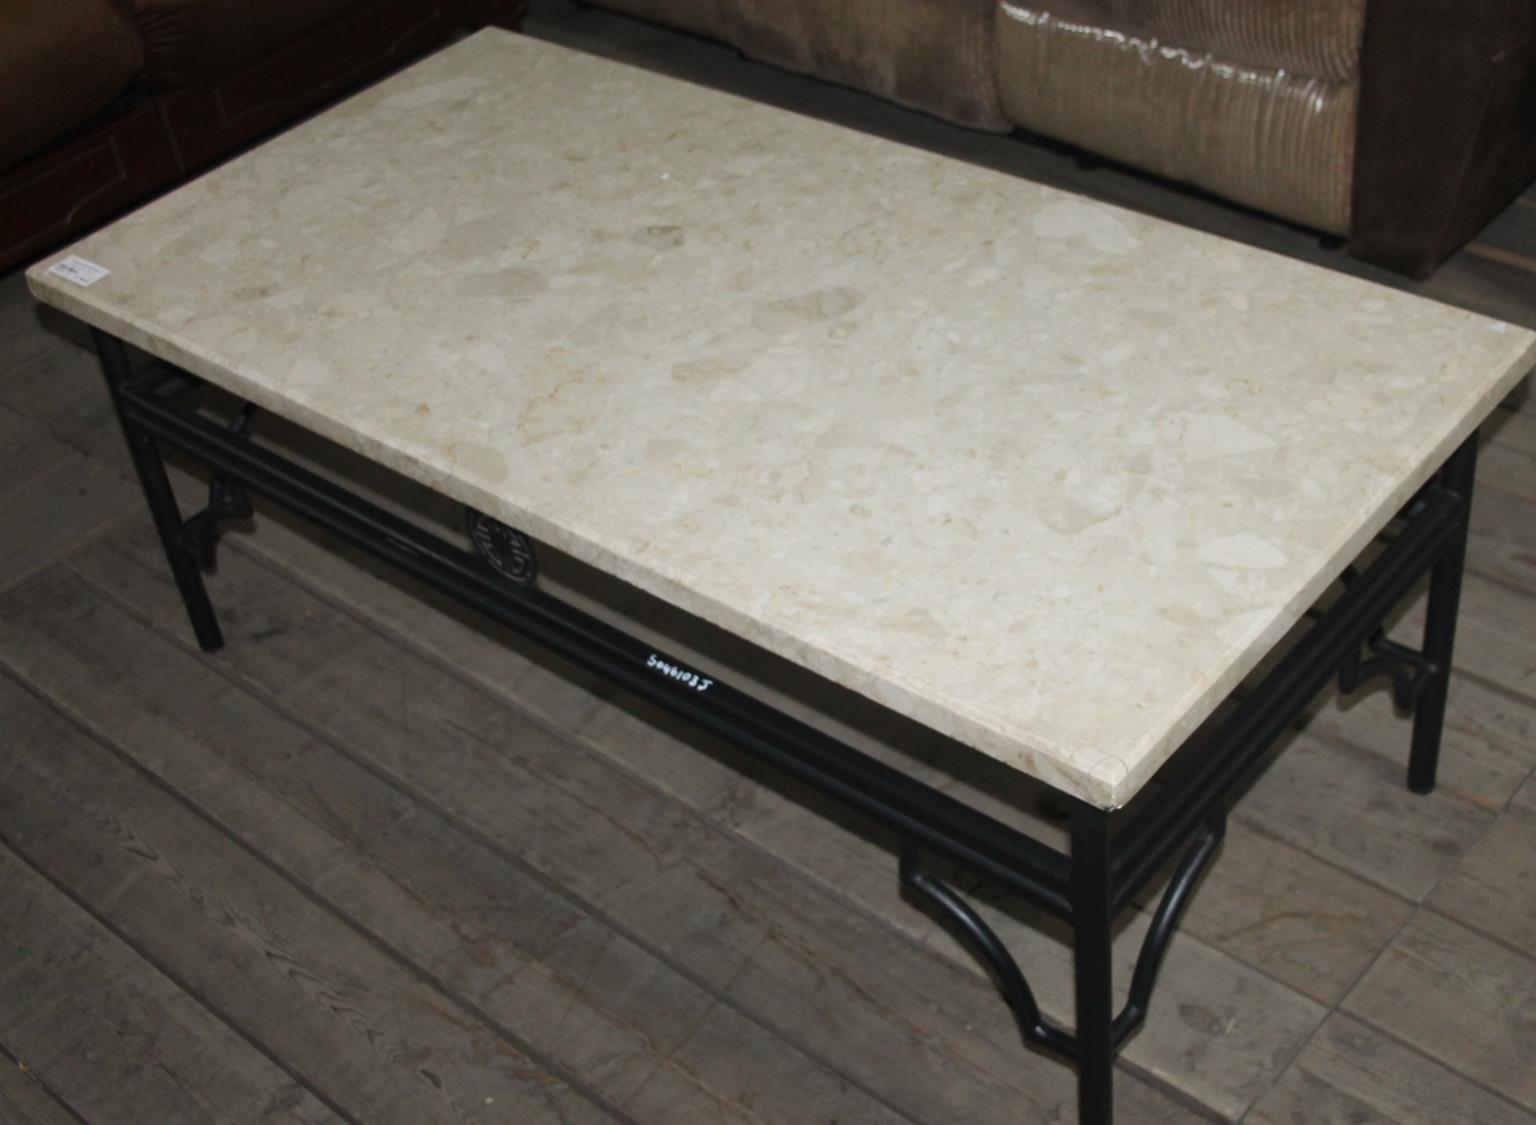 Granite coffee table S046103J #Rosettenvillepawnshop